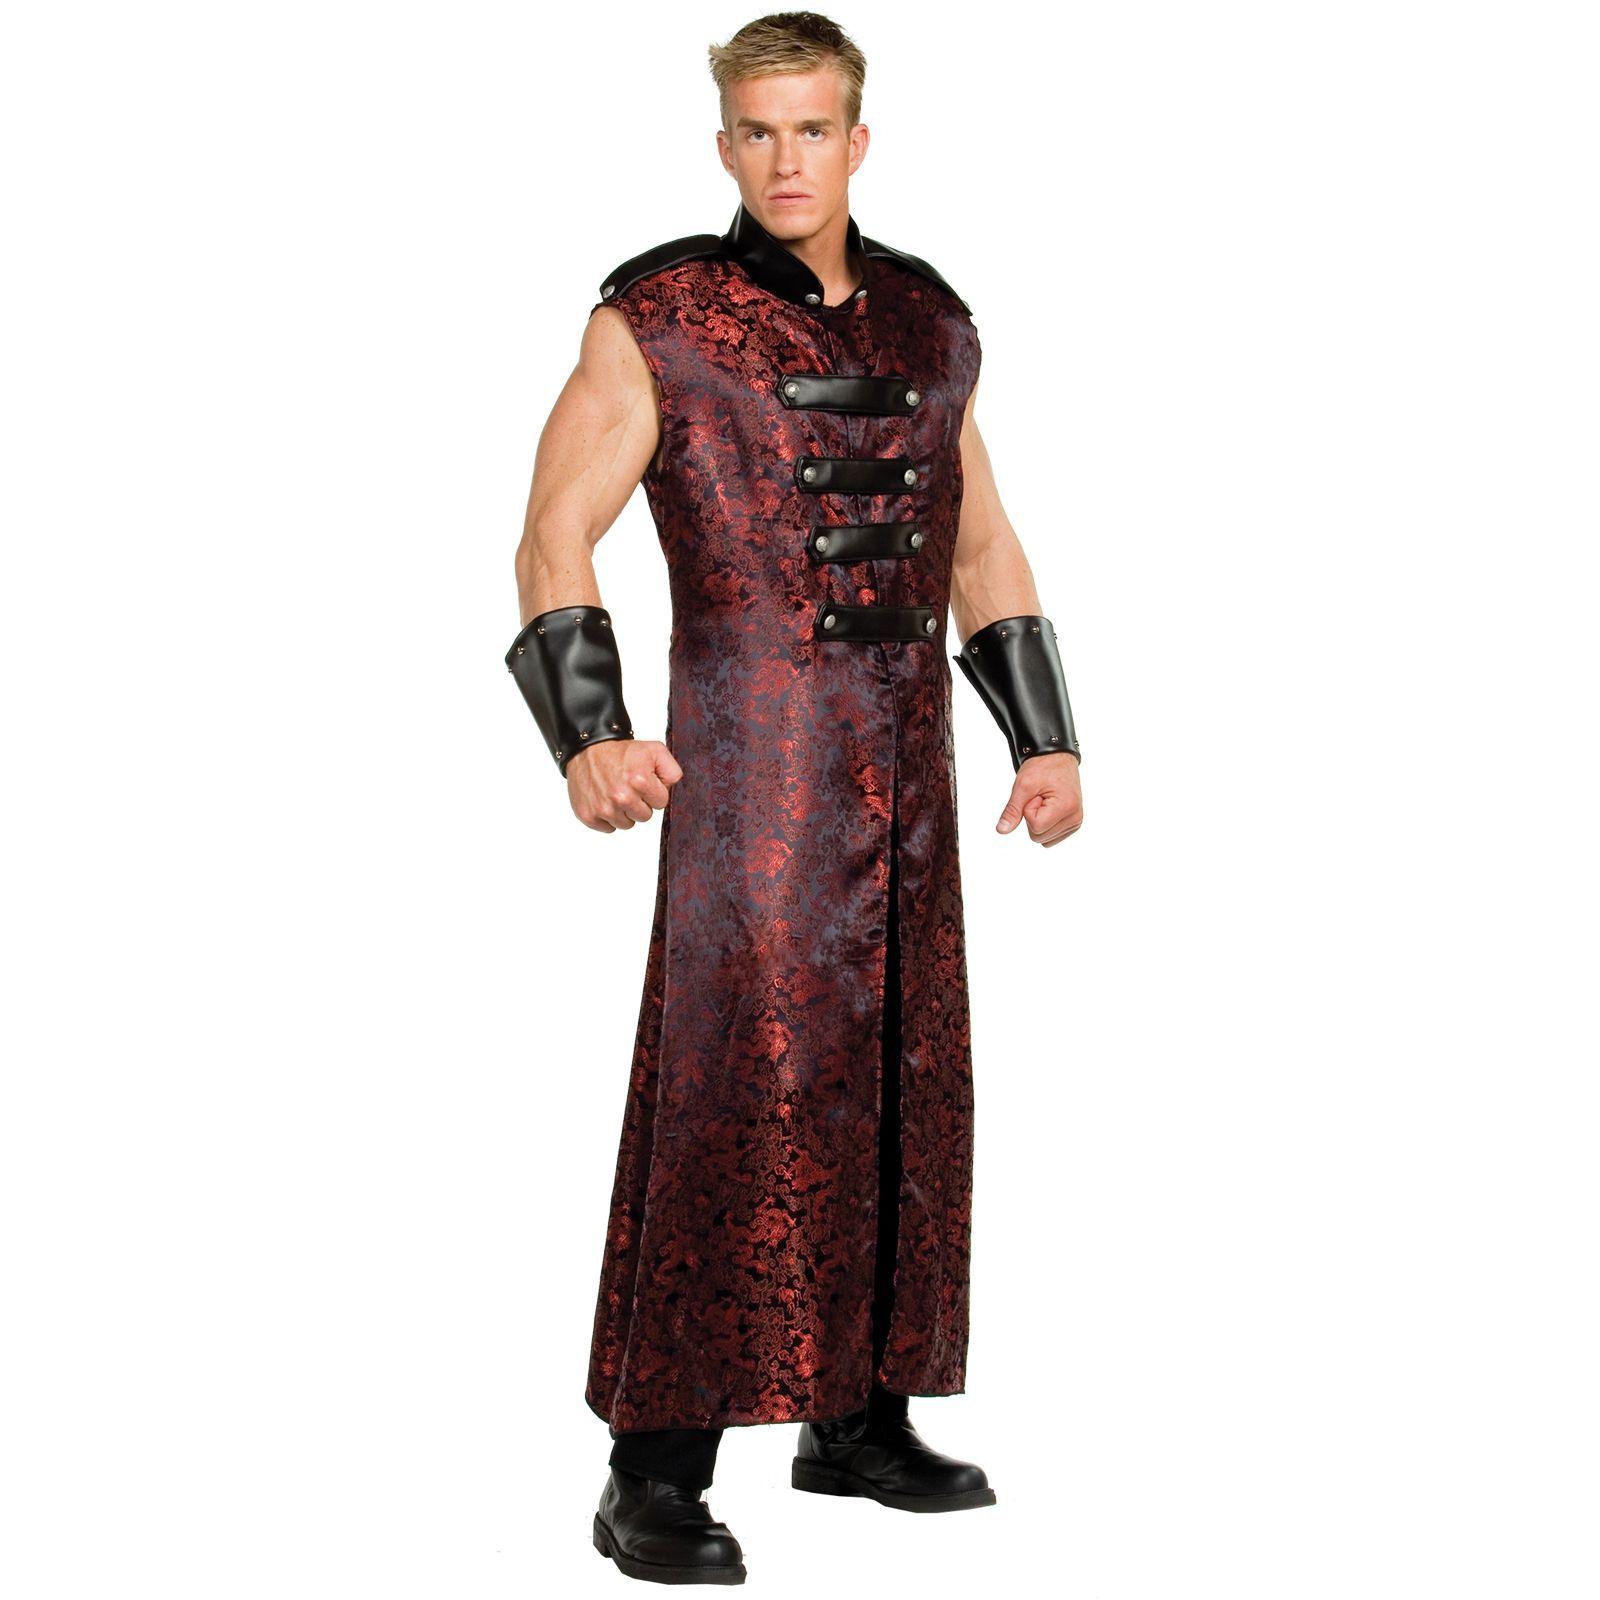 HALLOWEEN FANCY DRESS # GOTHIC FIEND GENTS MED